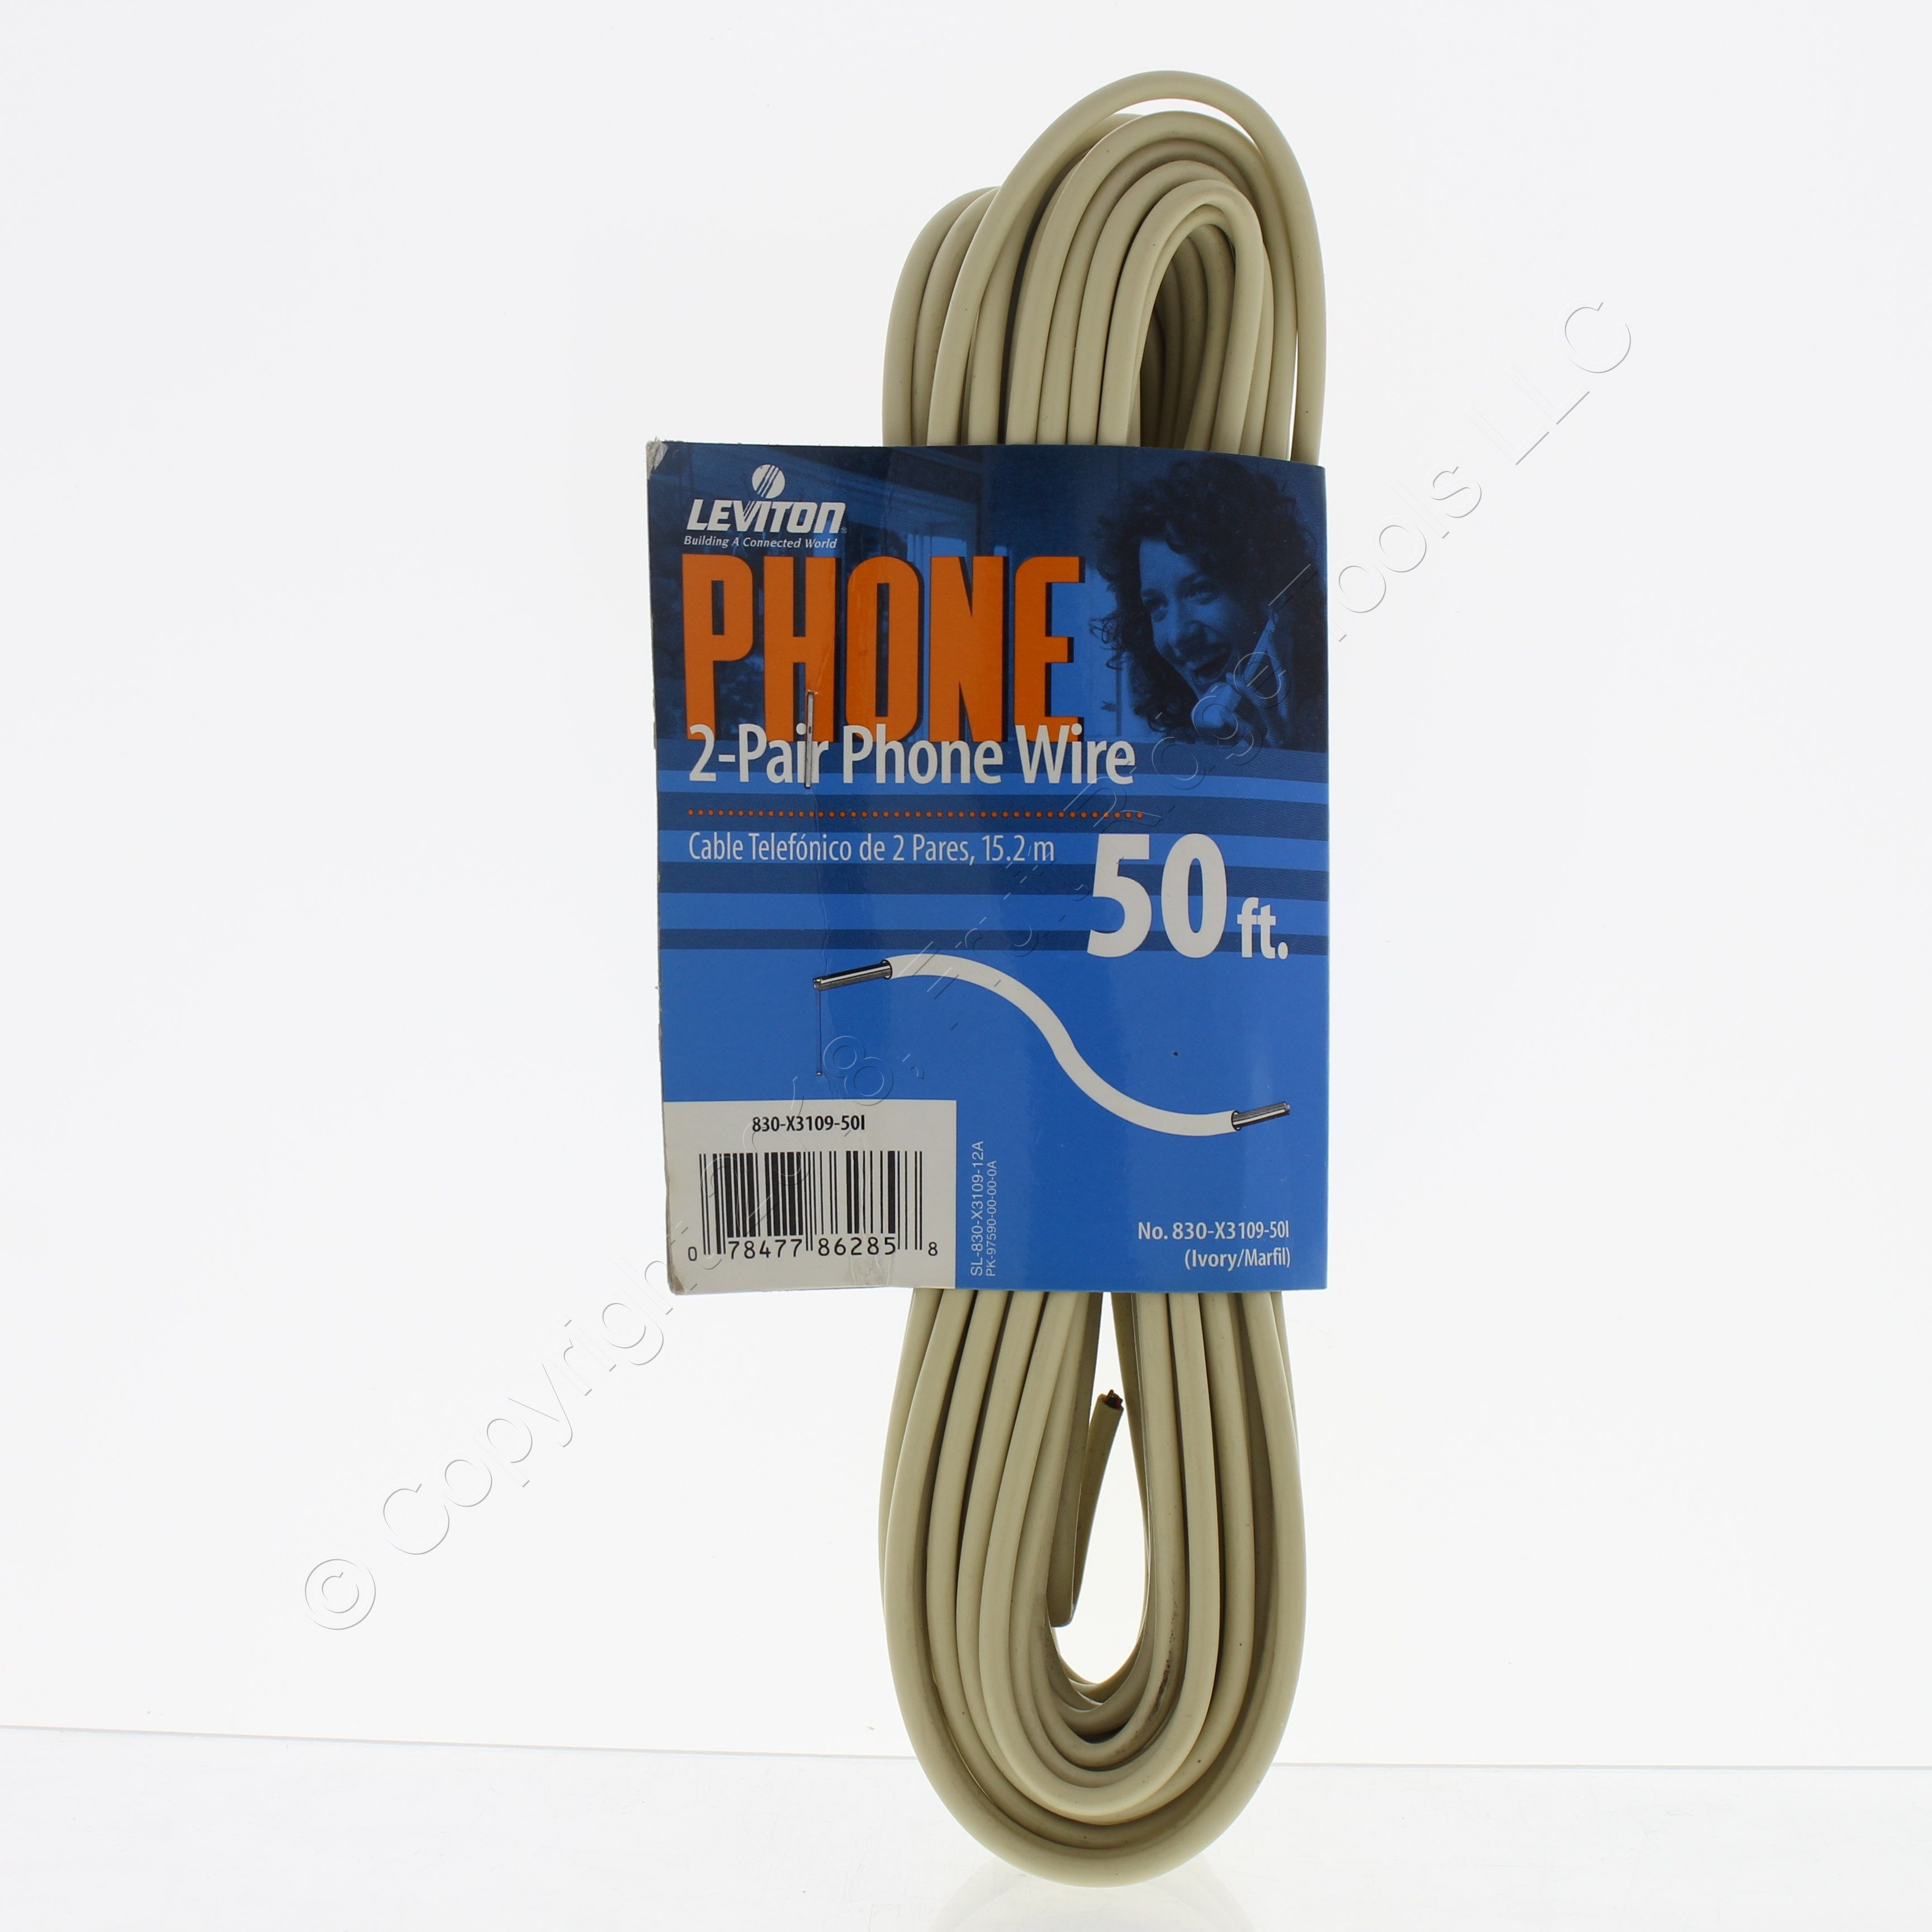 leviton 50 ft ivory 2 pair telephone wire phone cord 22 4 x3109 50i rh ebay com